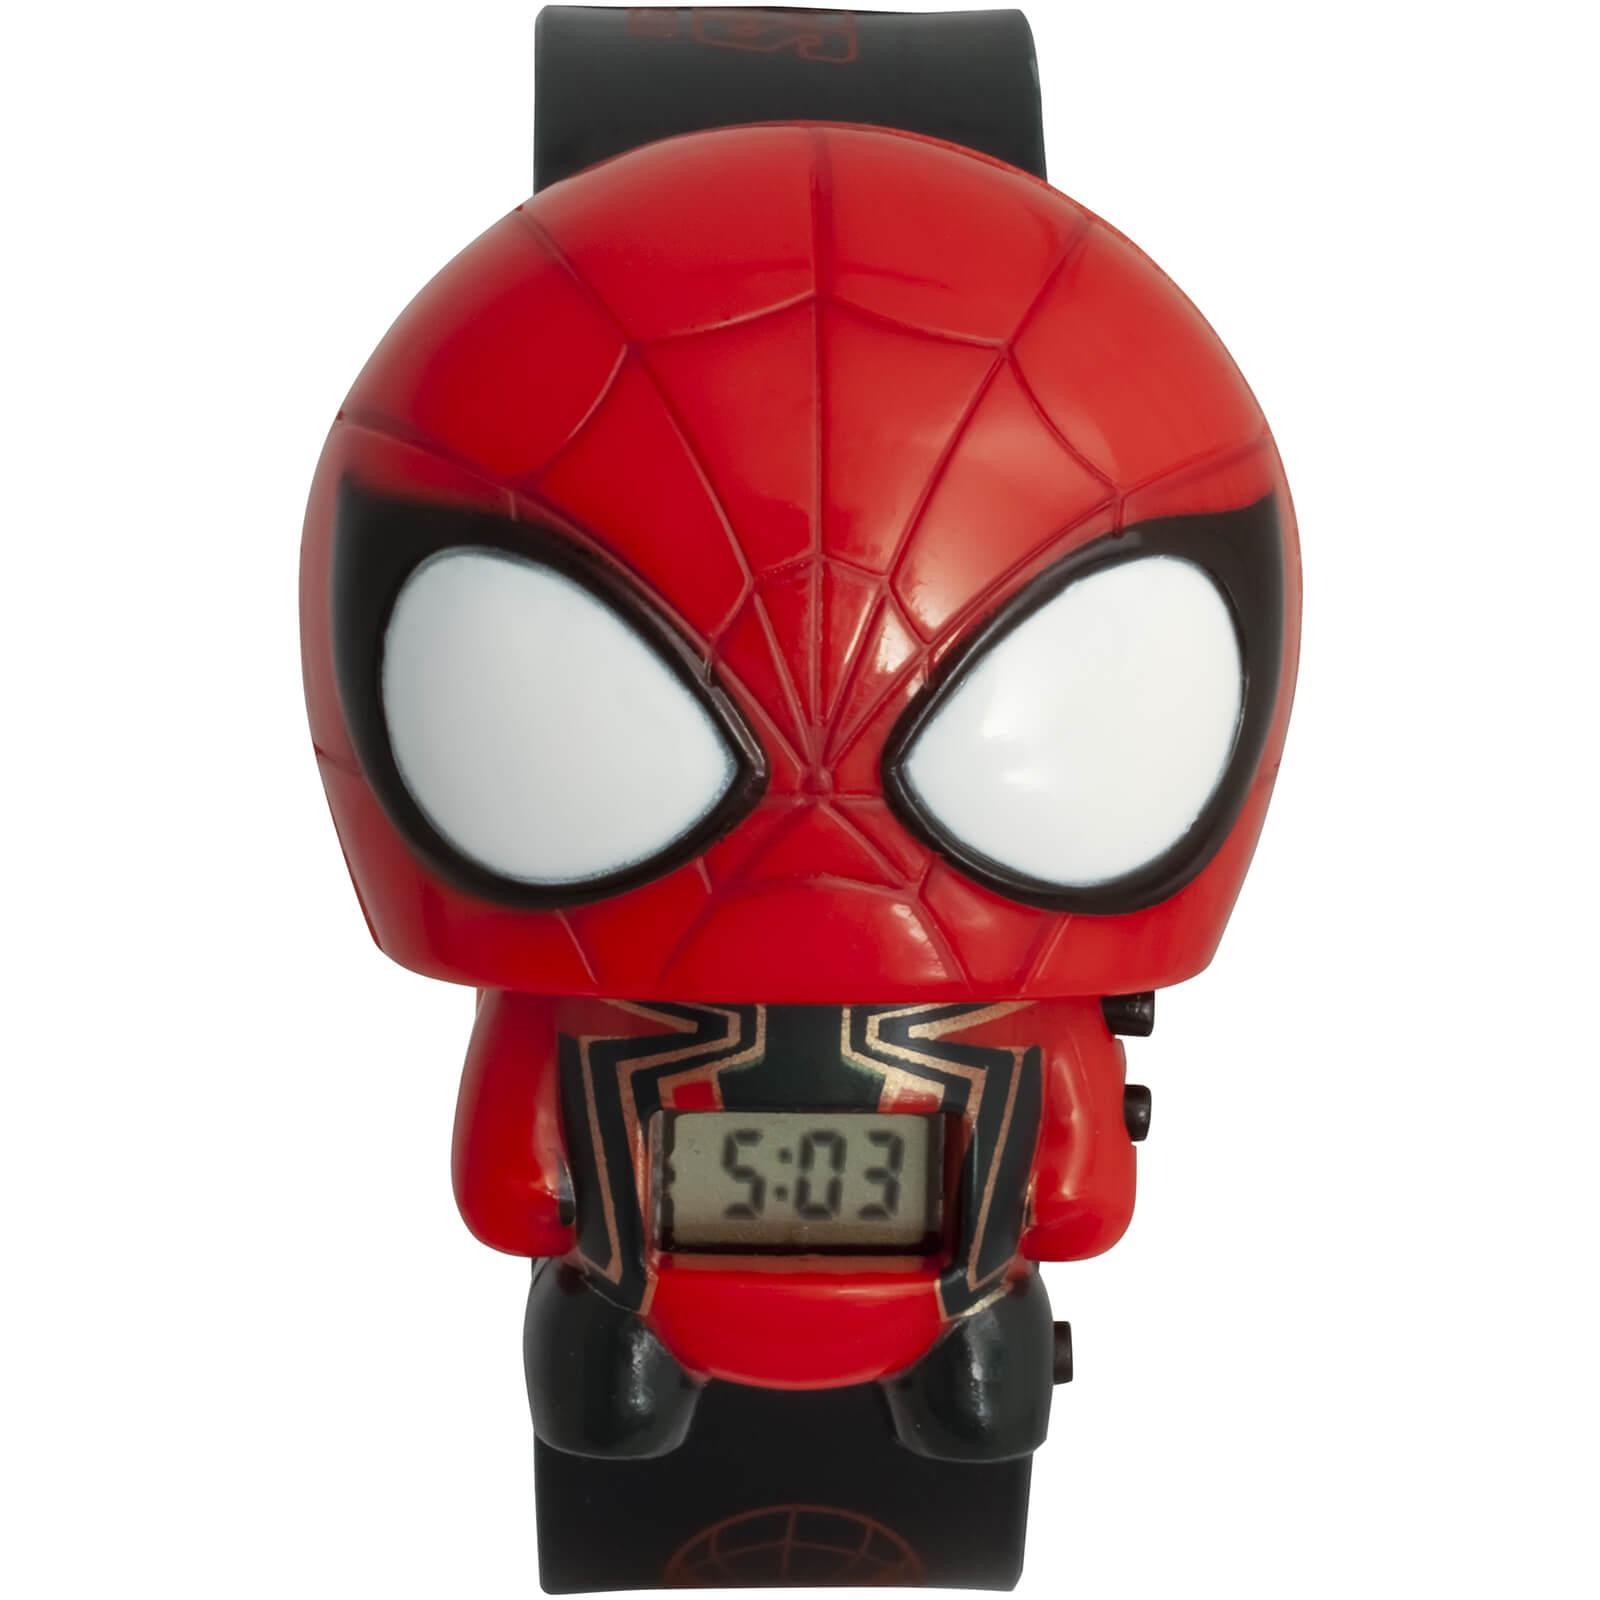 BulbBotz Marvel Avengers: Infinity War Iron Spider Watch